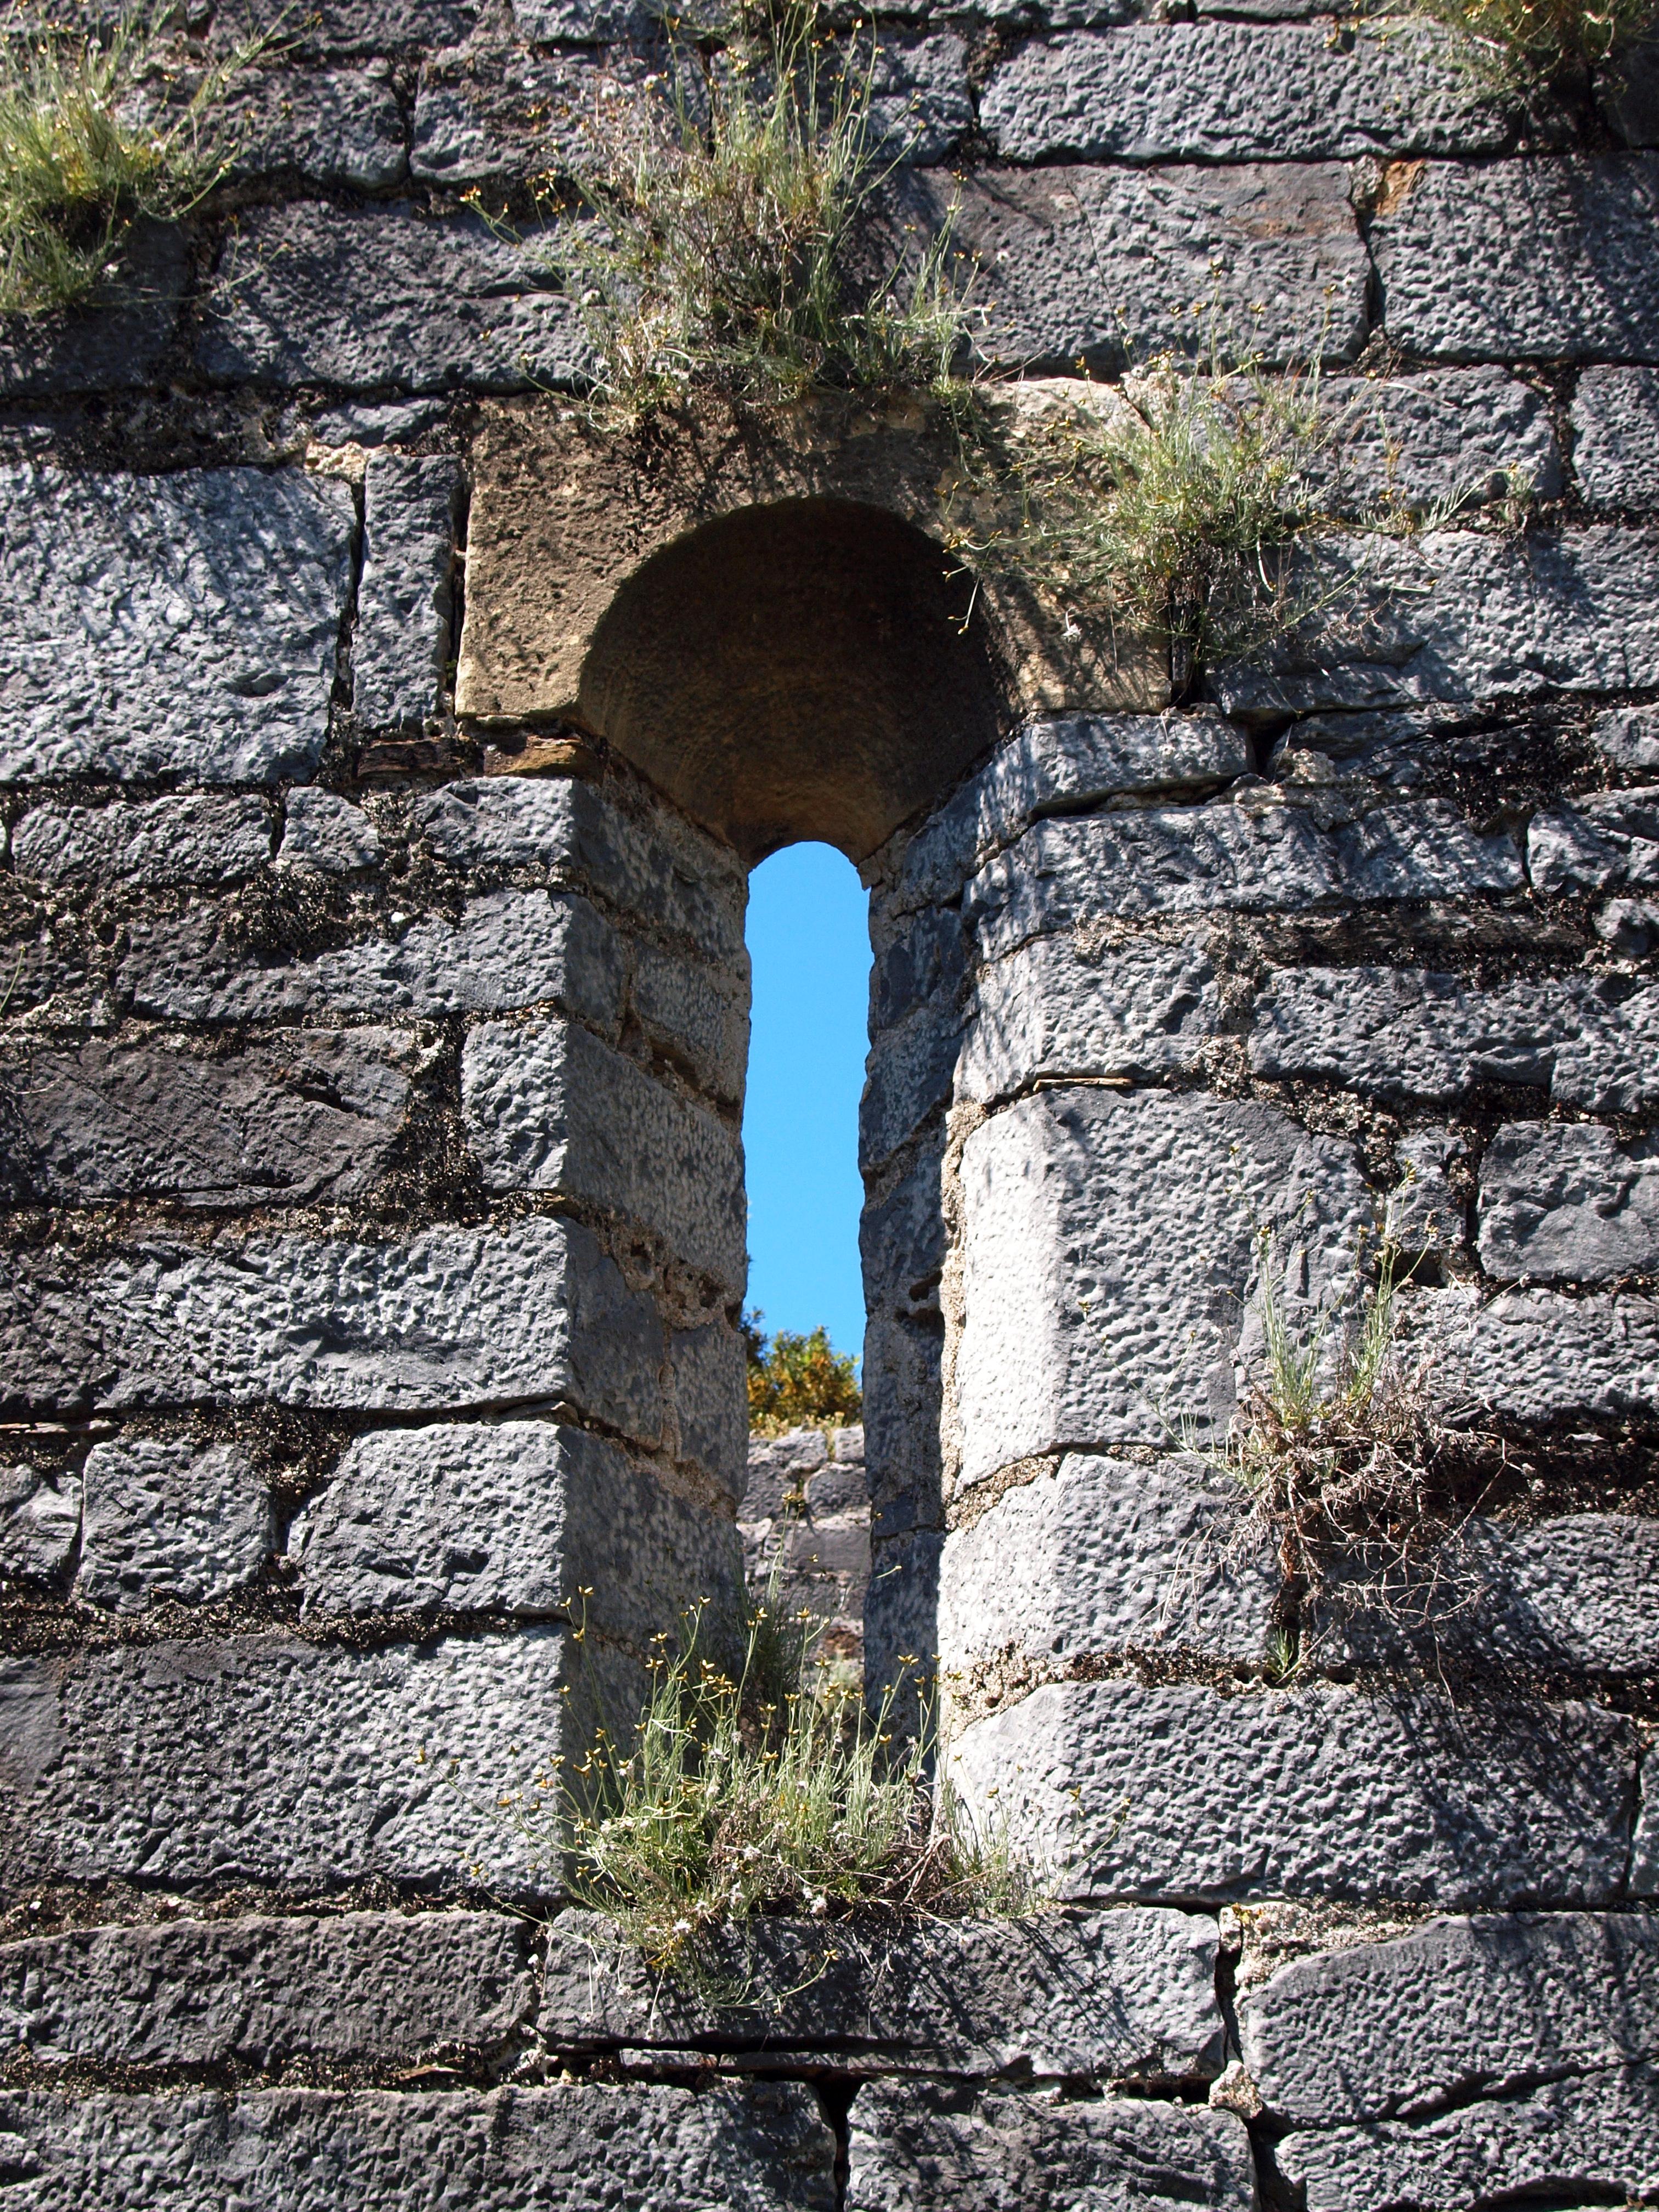 Poggio-d'Oletta San Quilico fenêtre-meurtrière façade sud.jpg